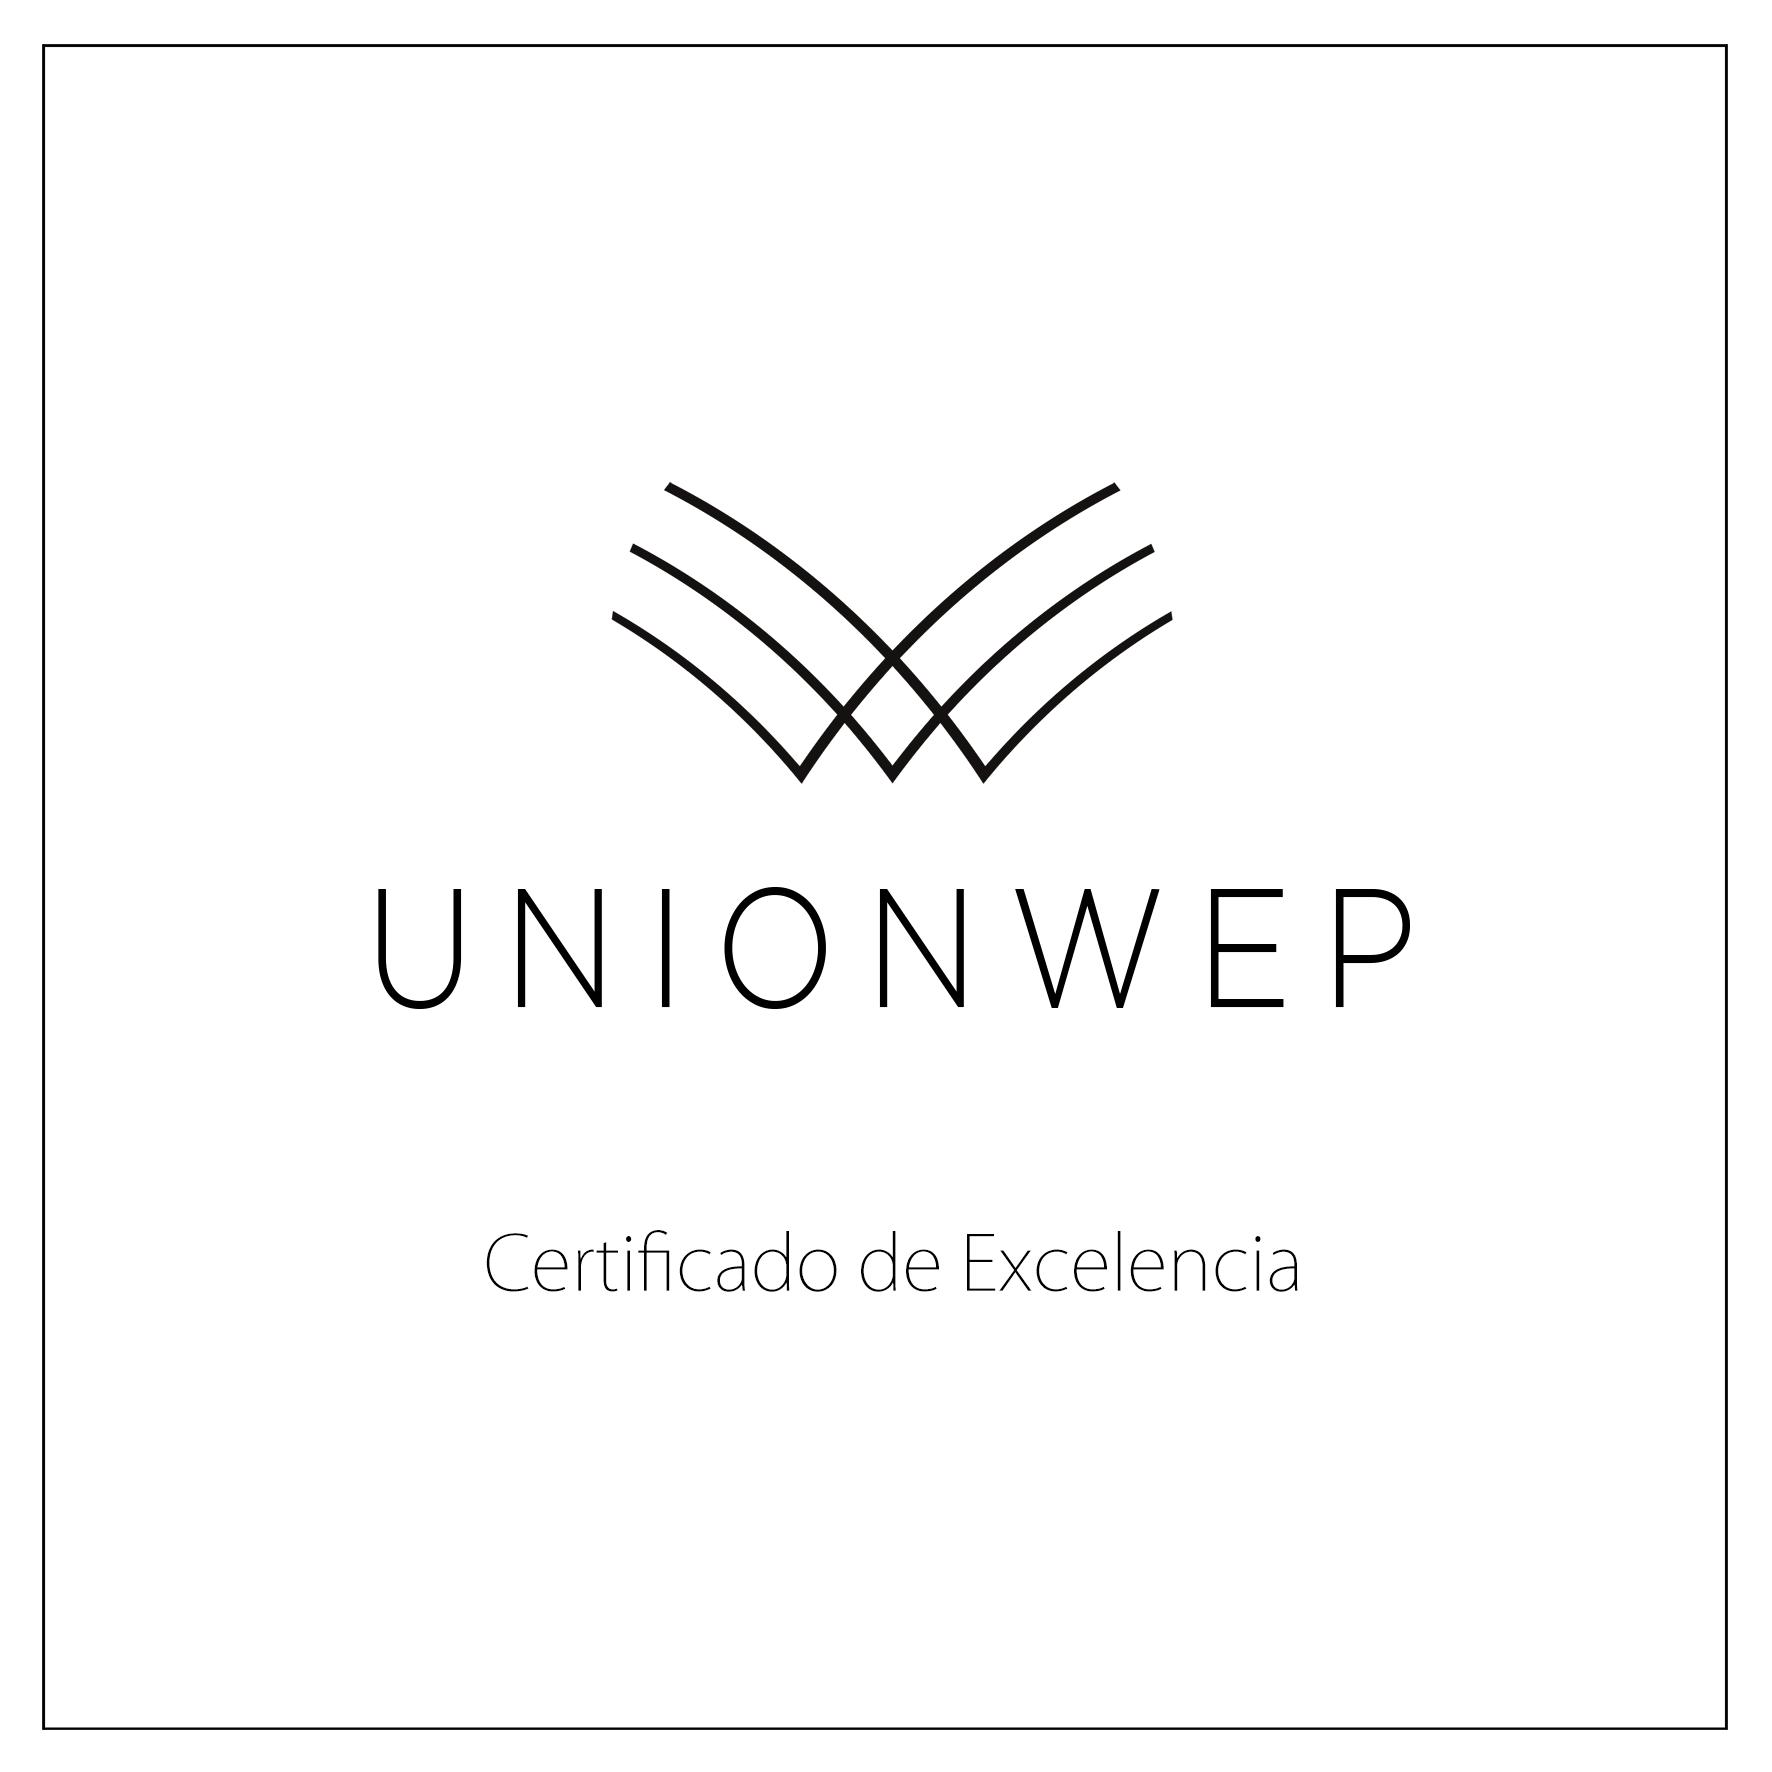 Certificado de excelencia Unionwep